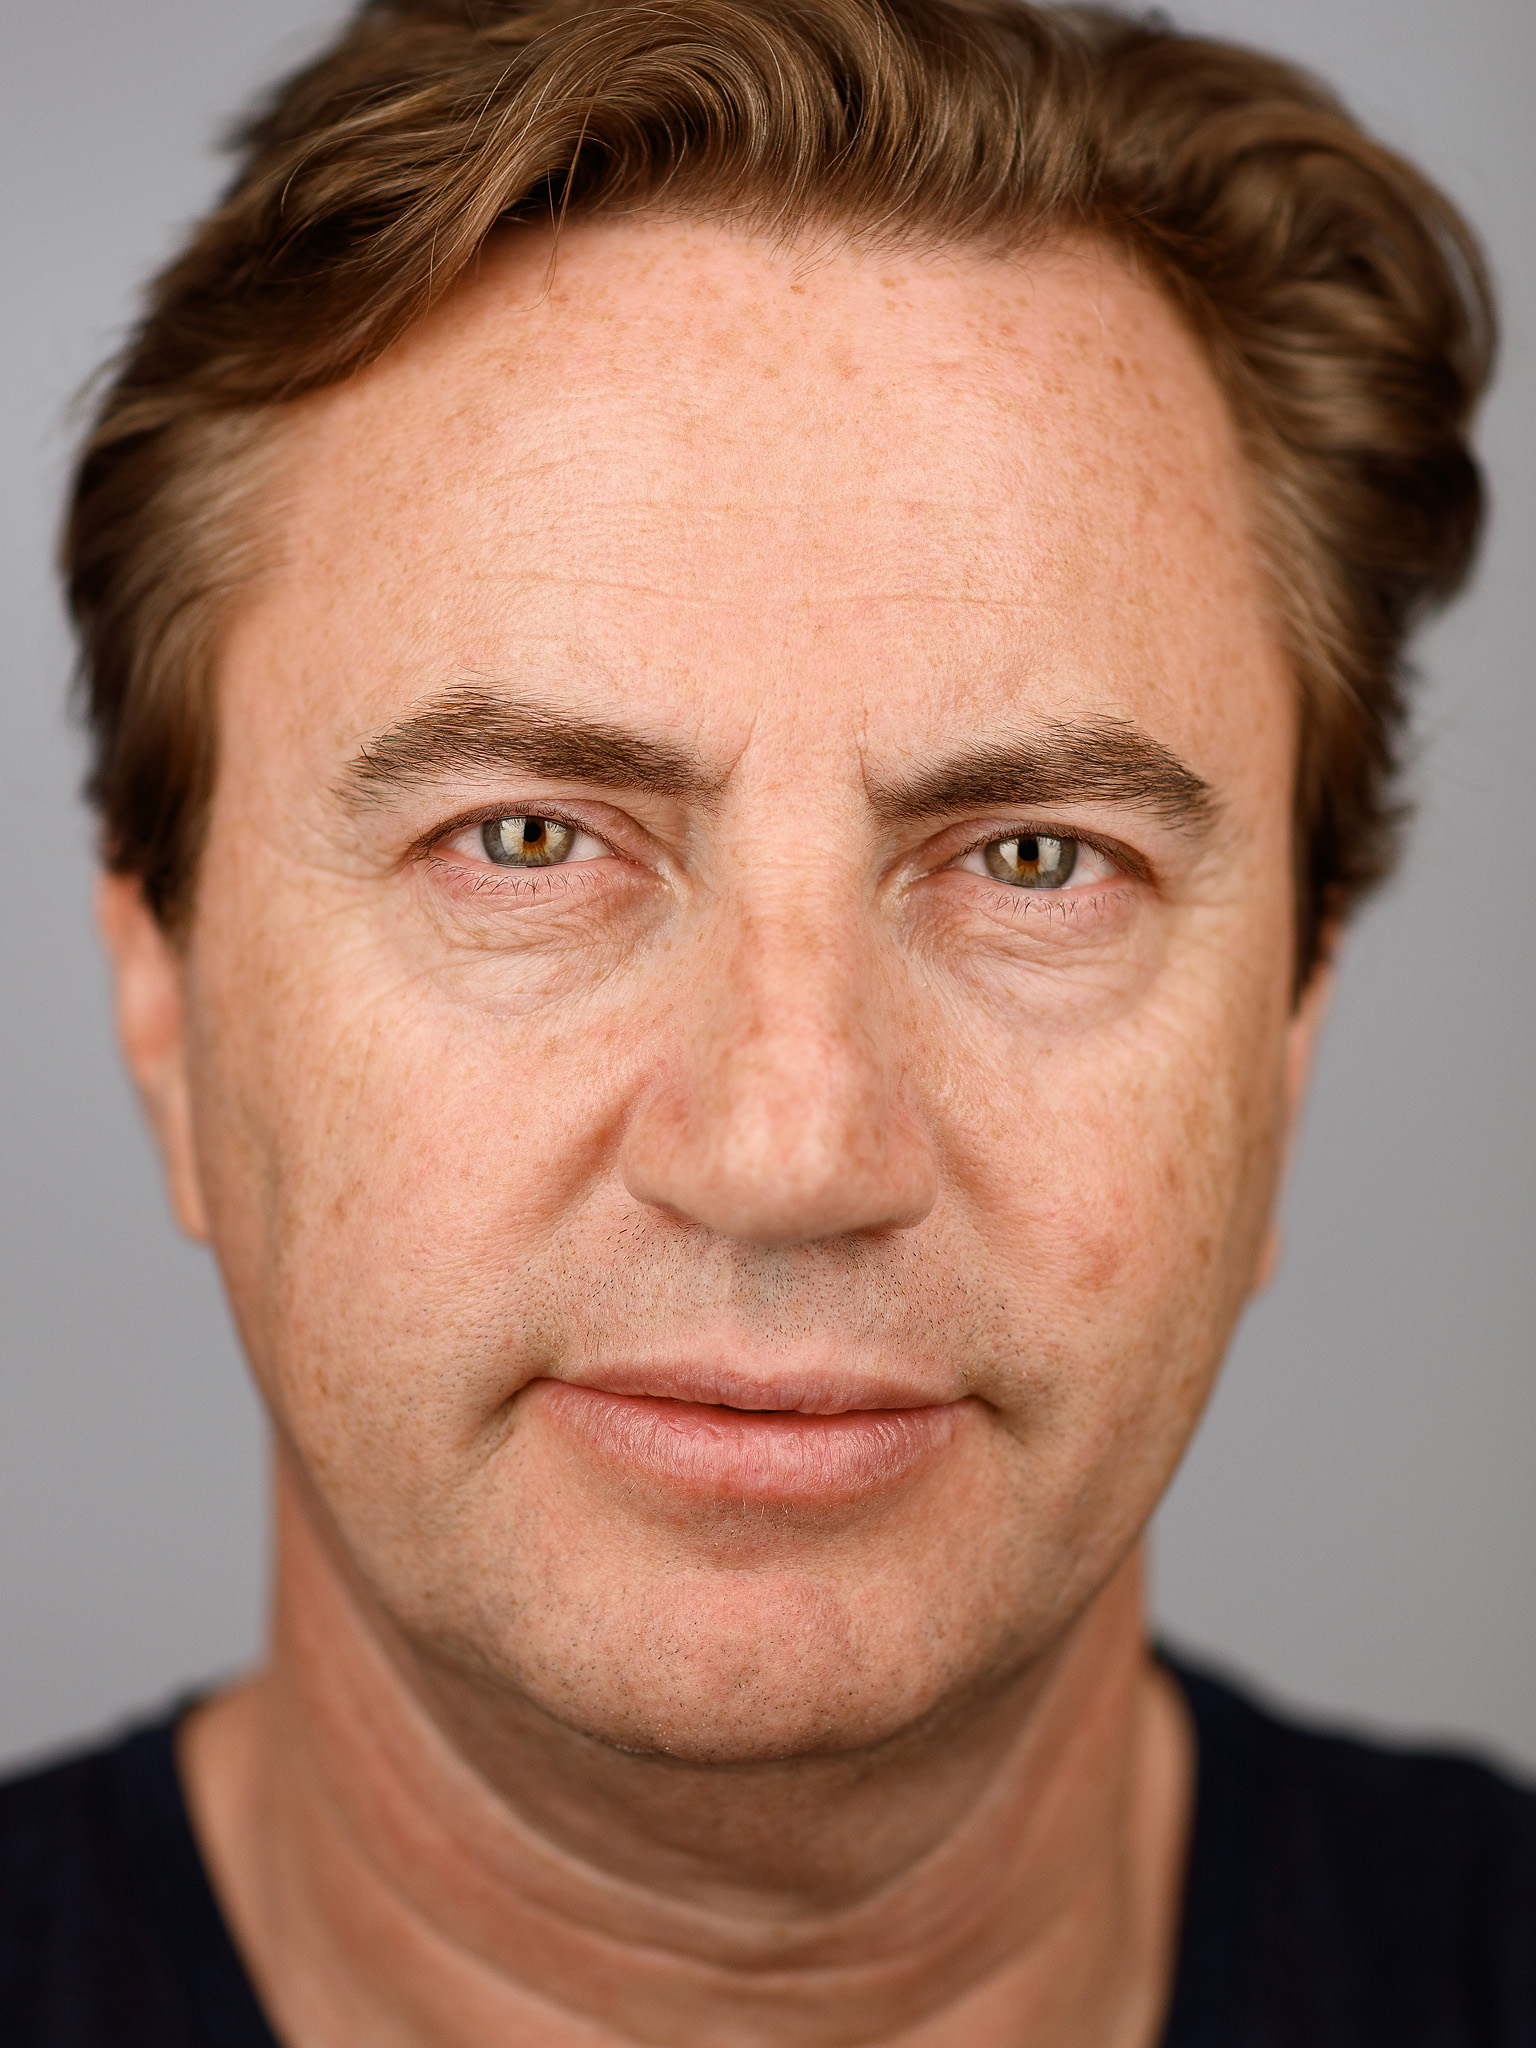 Frank De Mulder